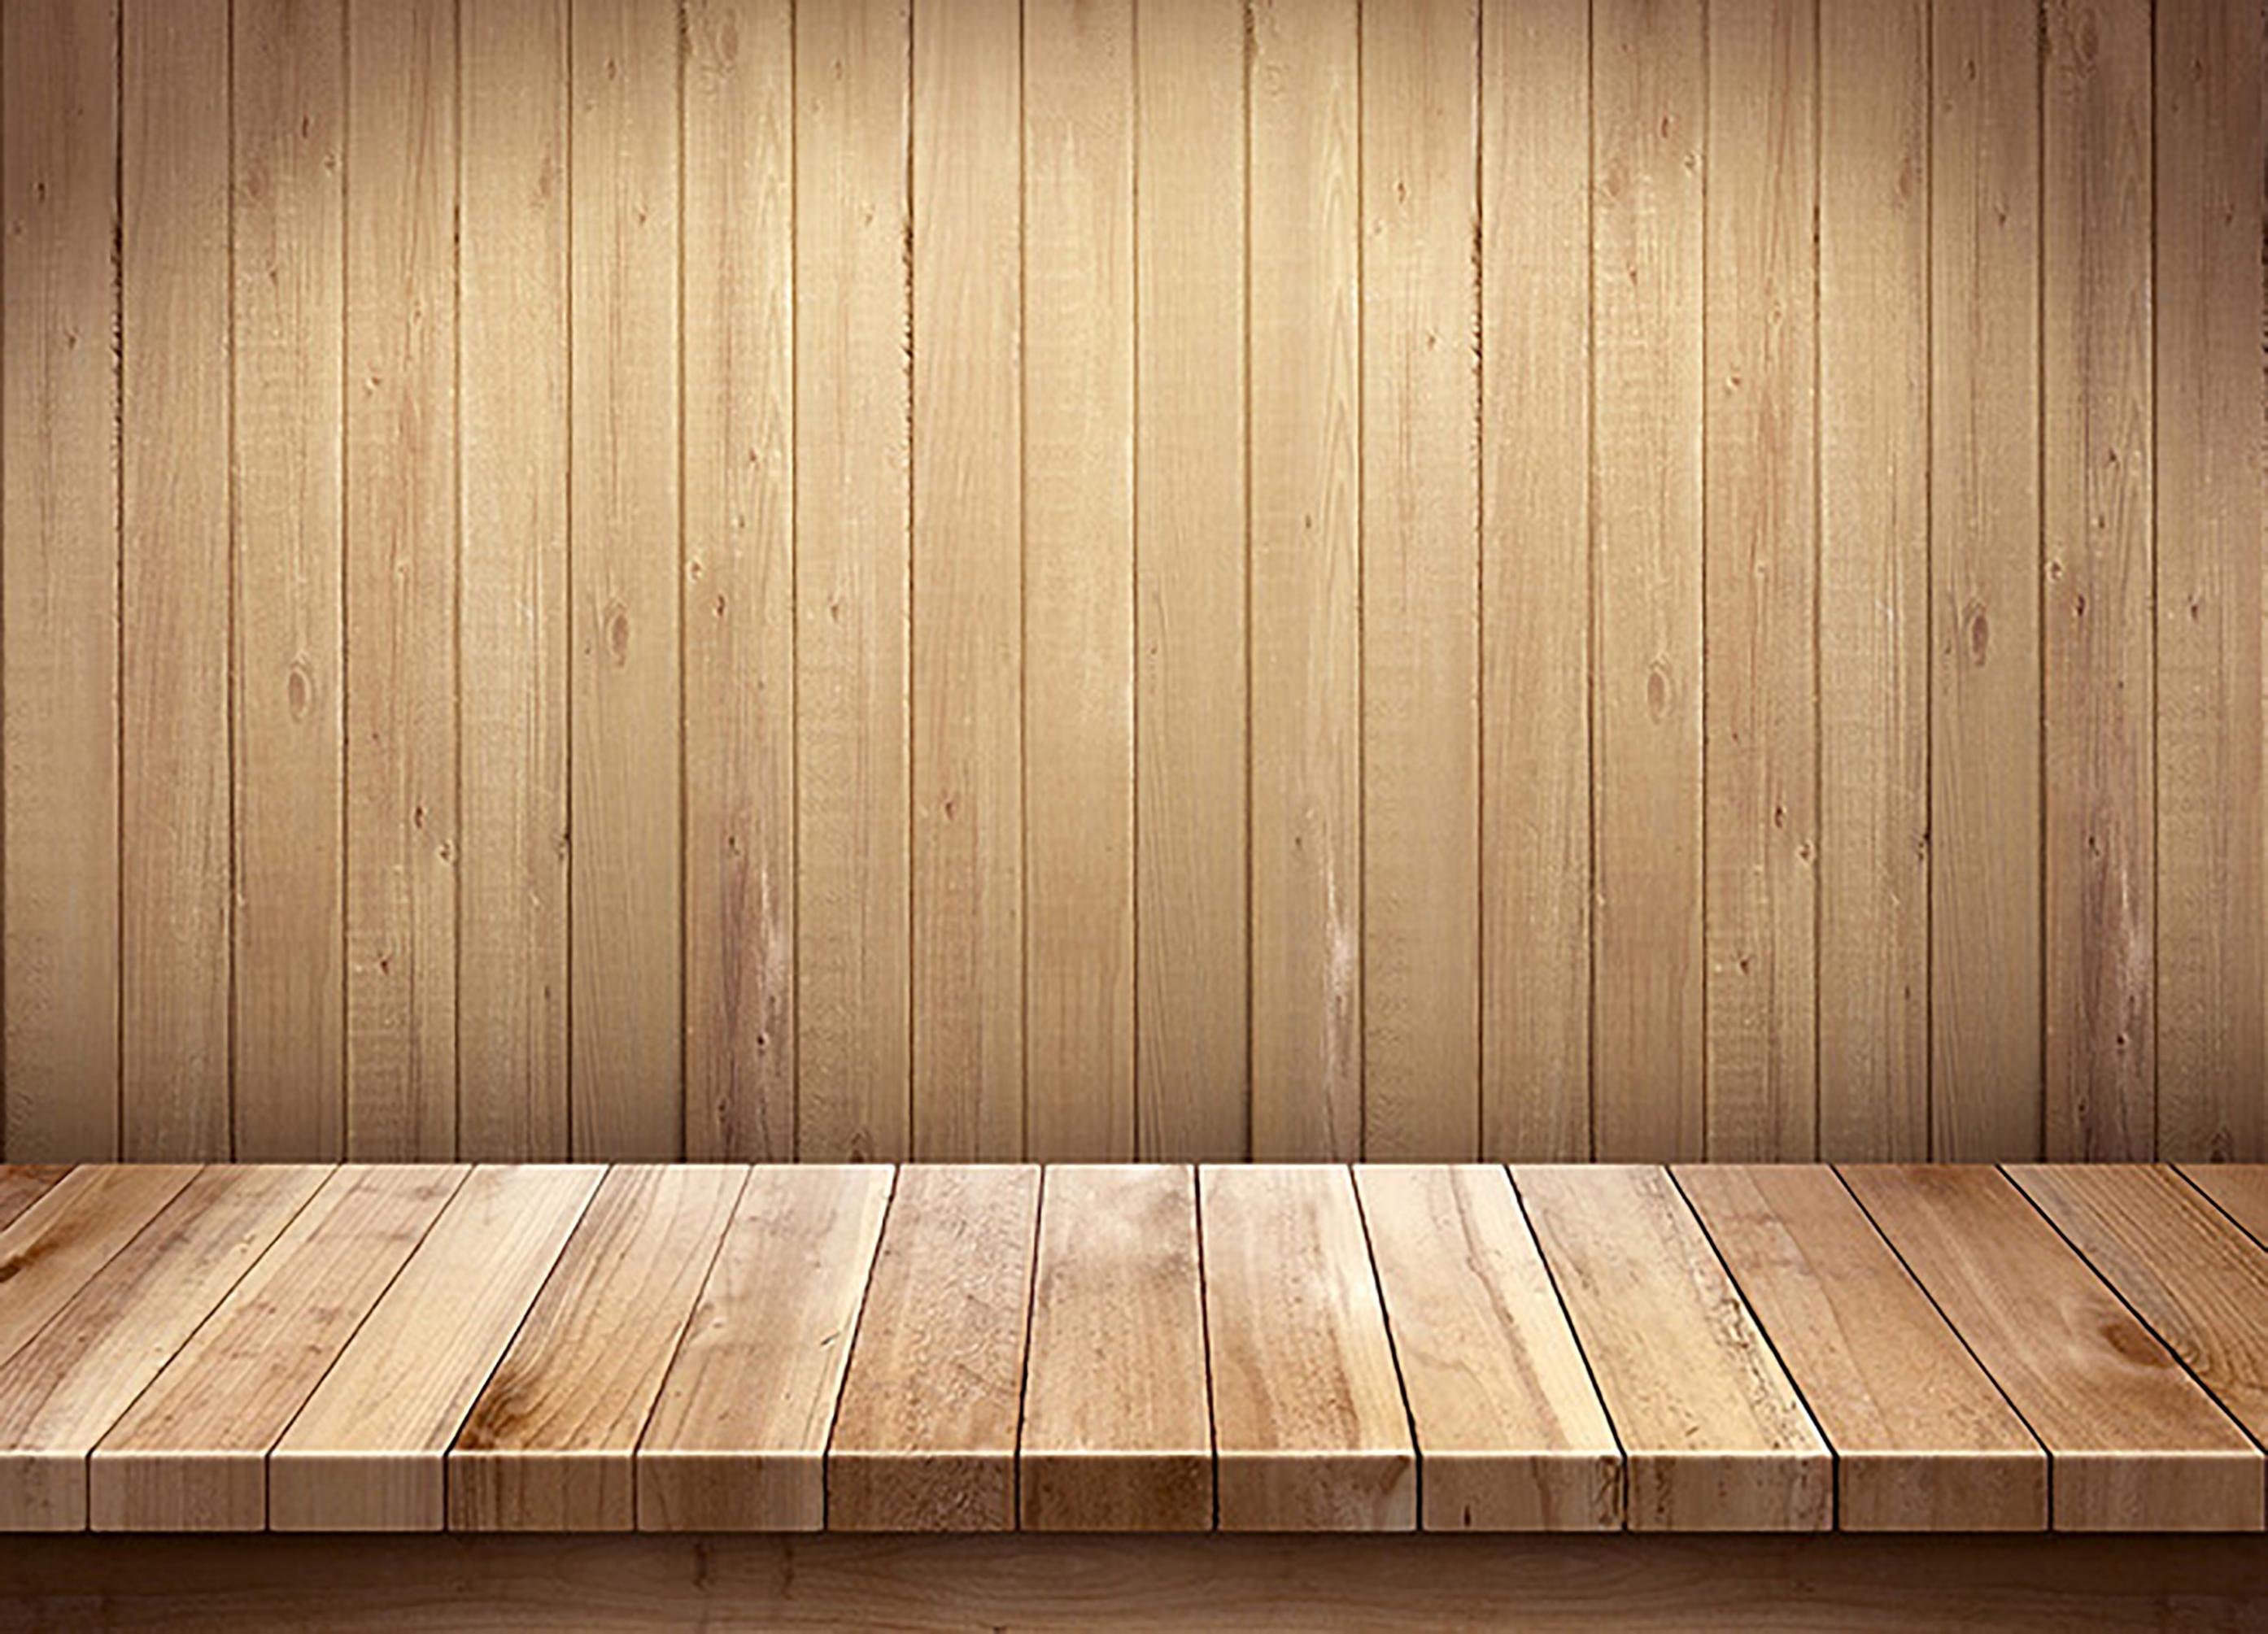 painel parede textura material background madeira textura